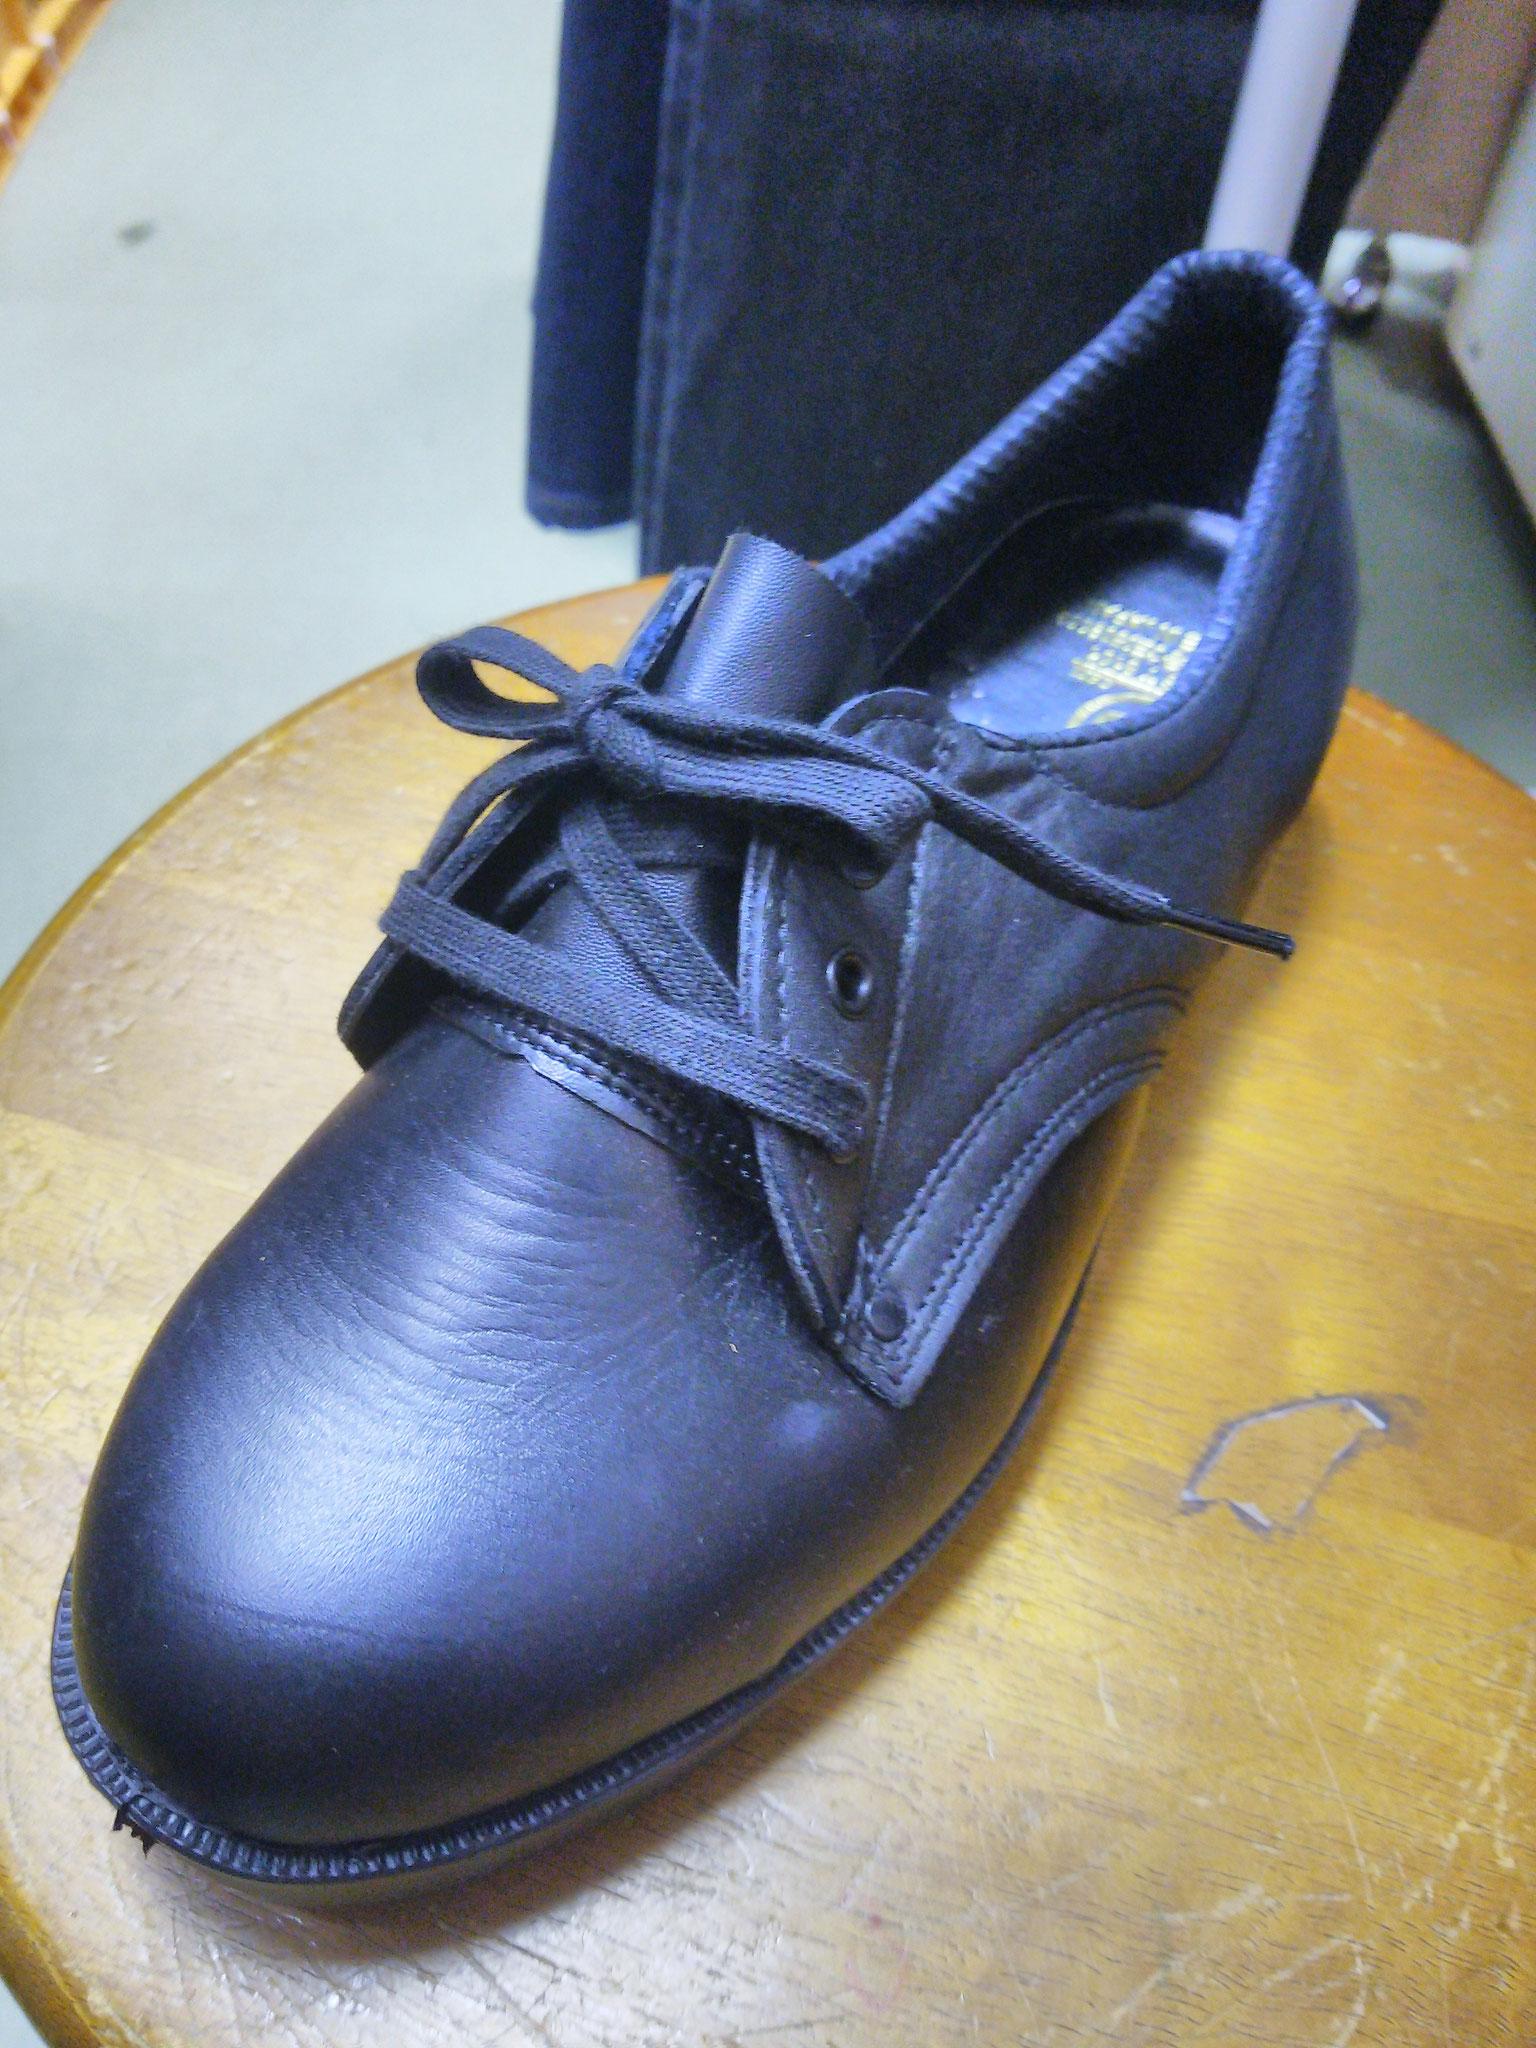 AN105V  革製安全靴  短靴  ¥3,990(税込)革製で最近珍しい「ガラス革」ですので、光沢と耐久性があります。